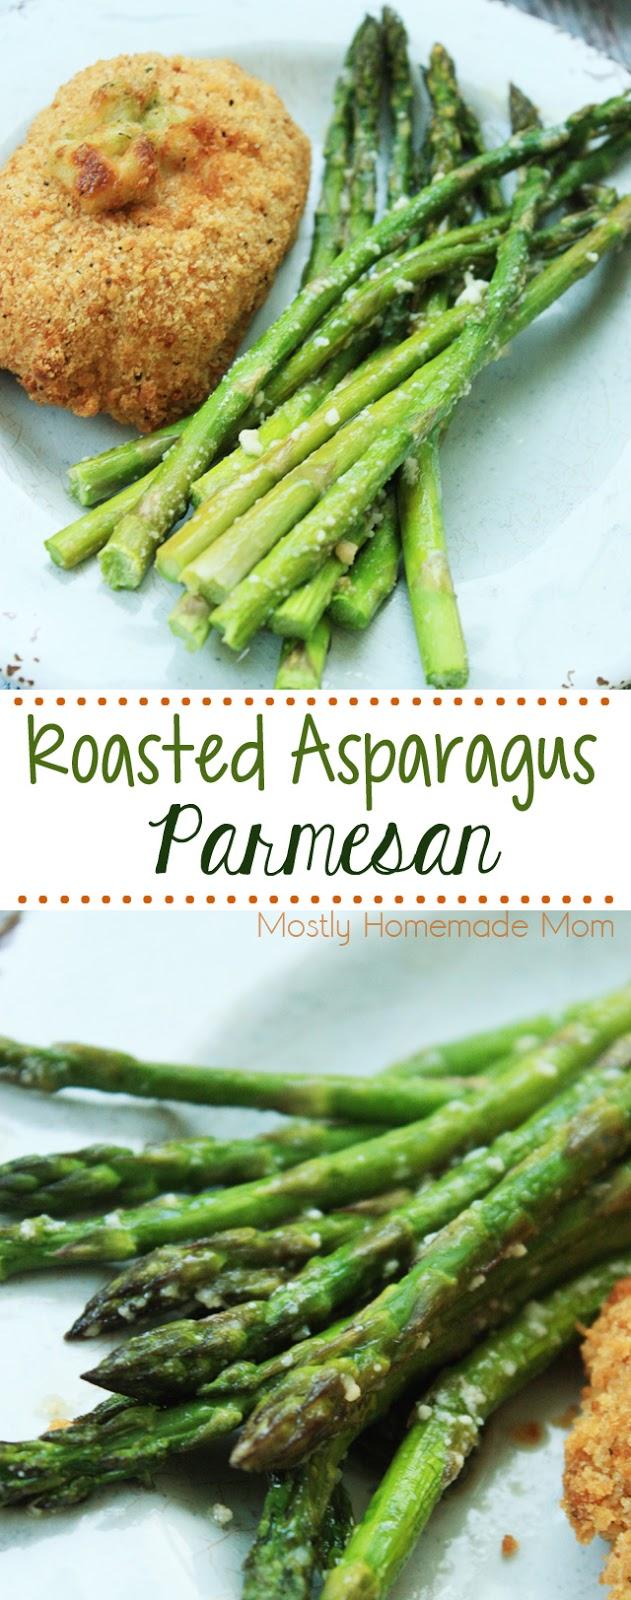 Baked Asparagus Parmesan